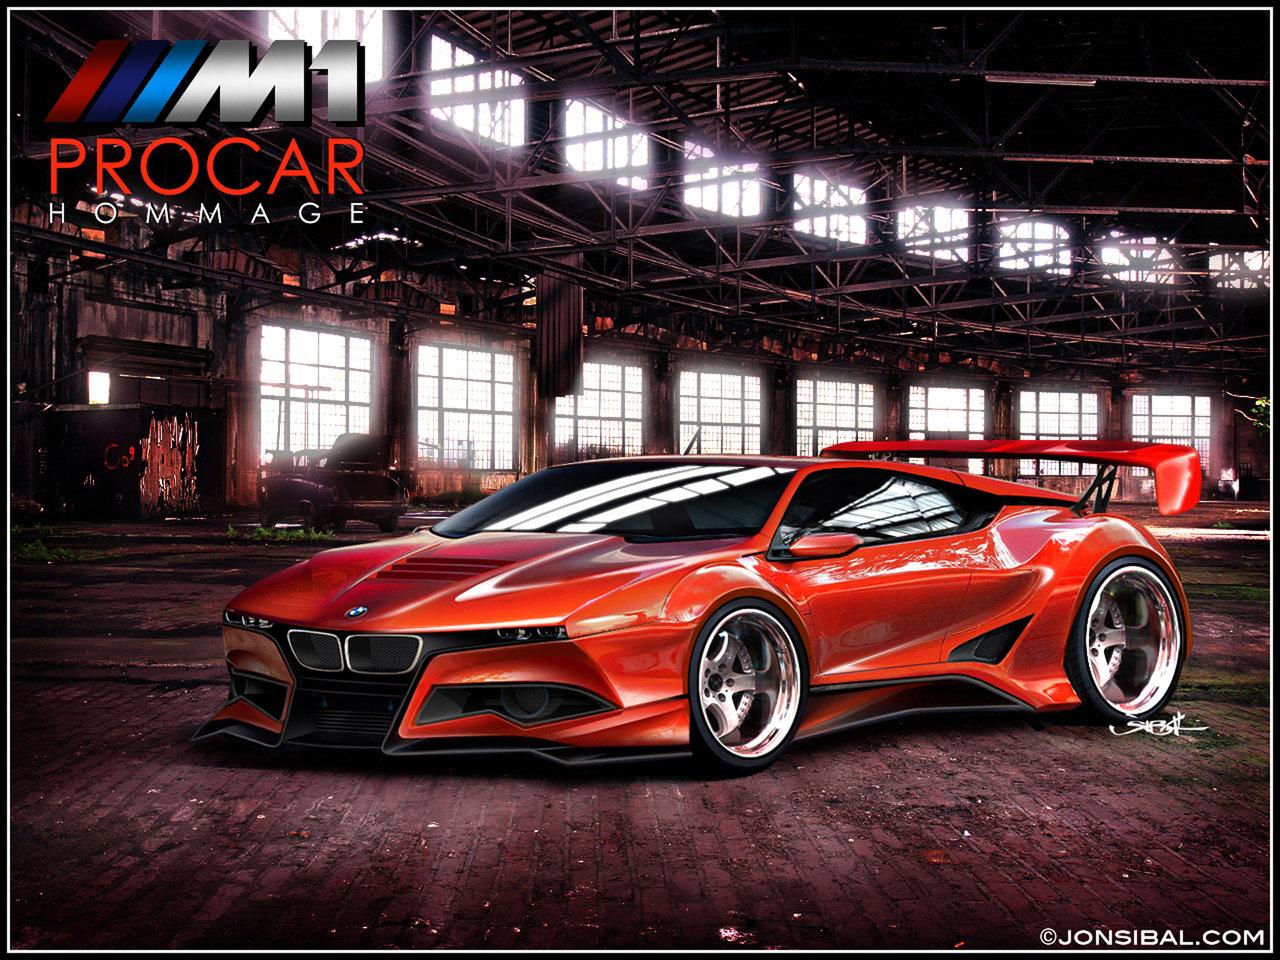 http://3.bp.blogspot.com/_q_X4h8fOP7A/TR9EXvLbhqI/AAAAAAAAATg/F7pNq2BoZXM/s1600/BMW_M1_PROCAR_Hommage_by_jonsibal.jpg